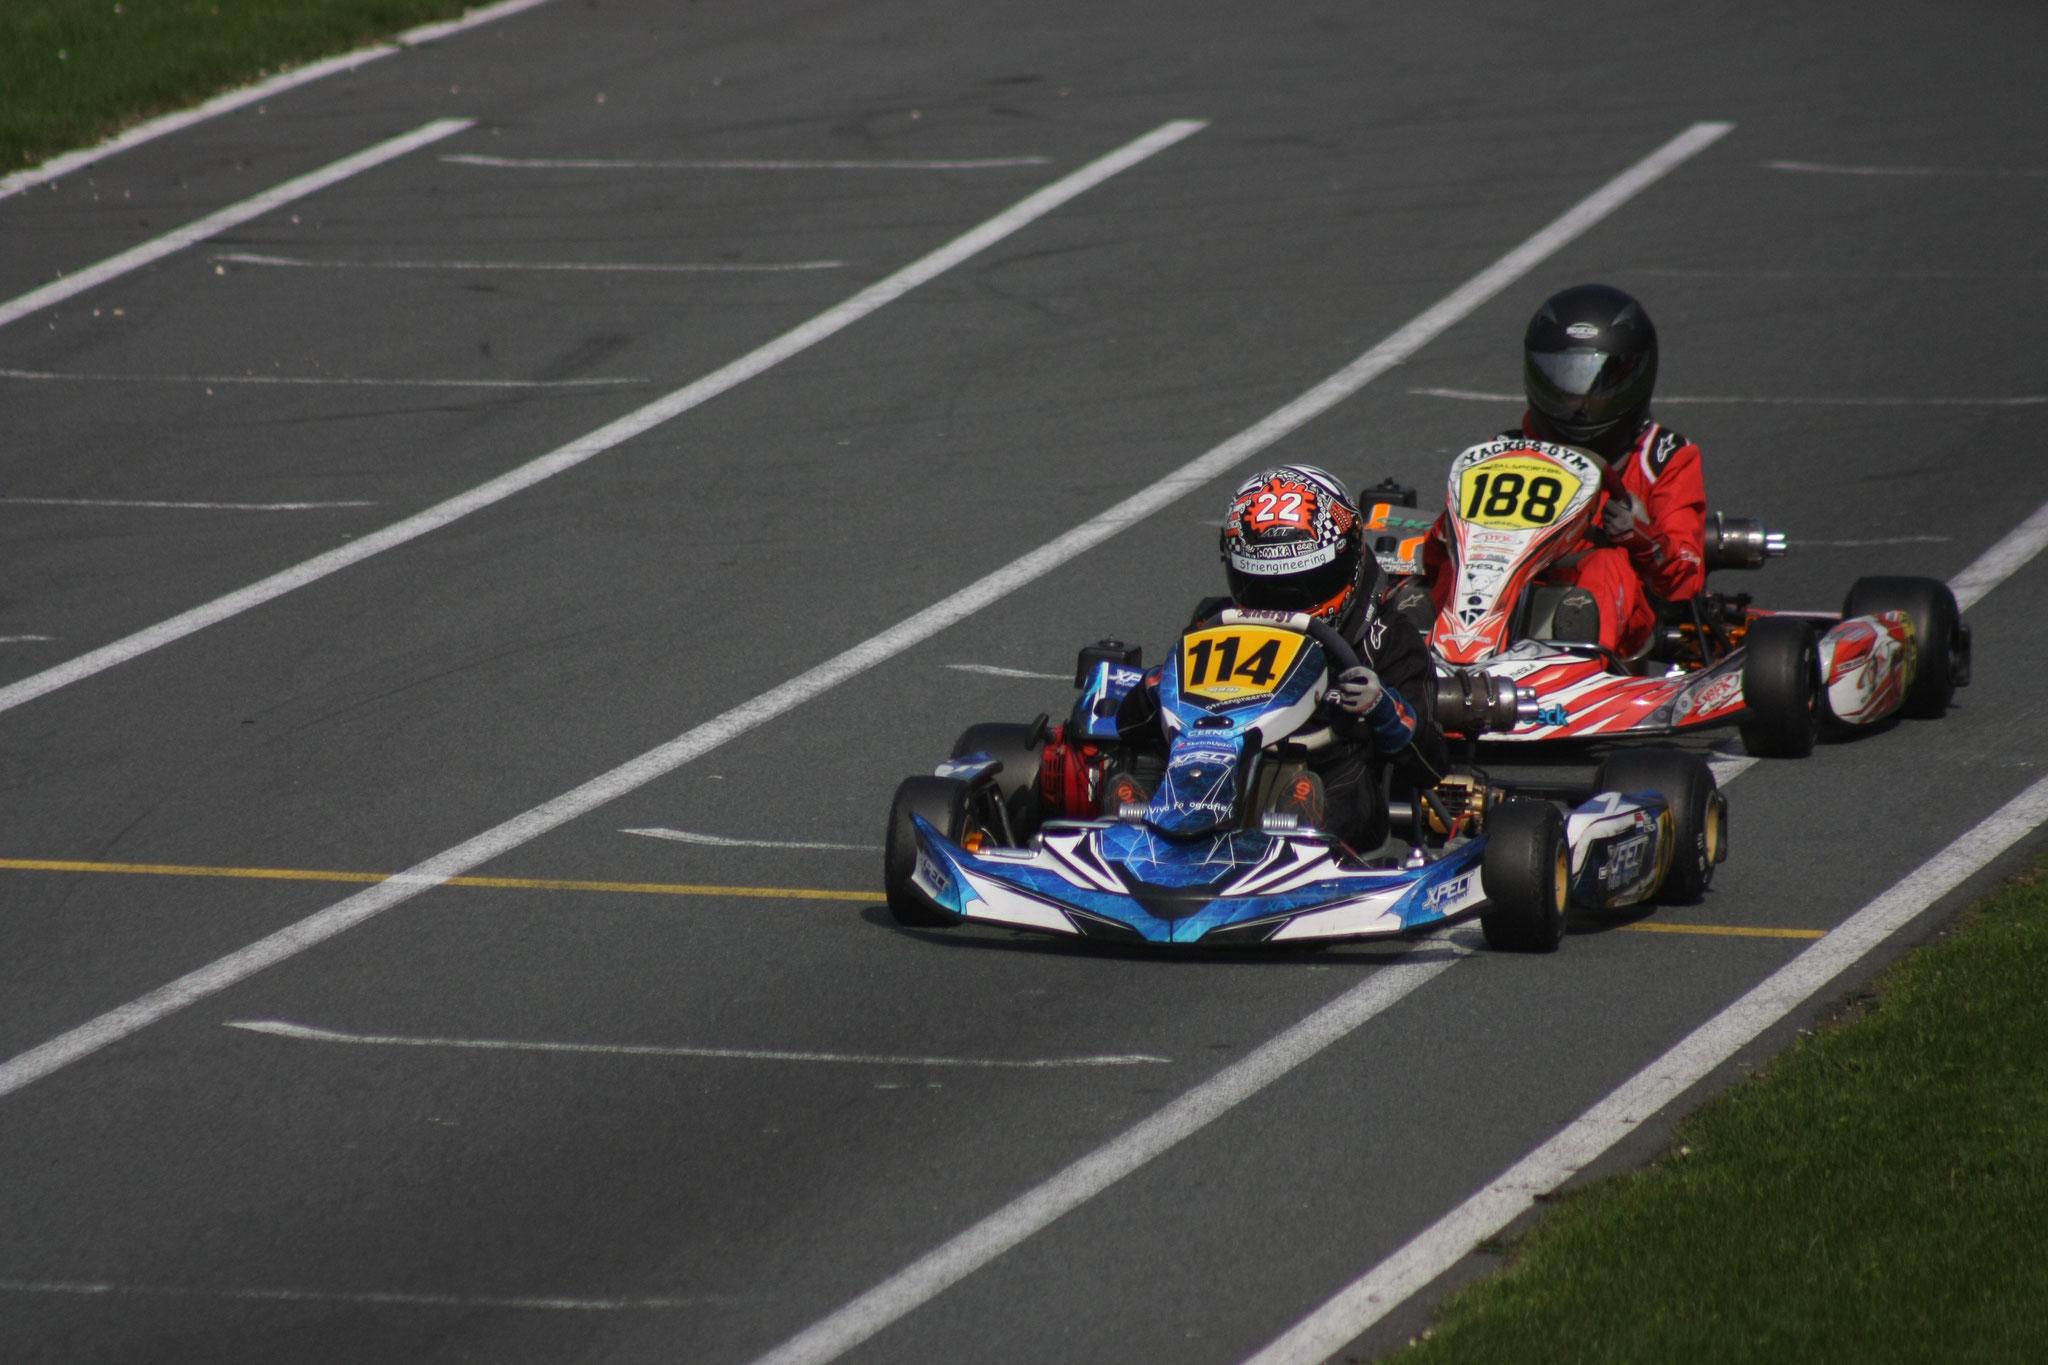 Kwalificatie race 1